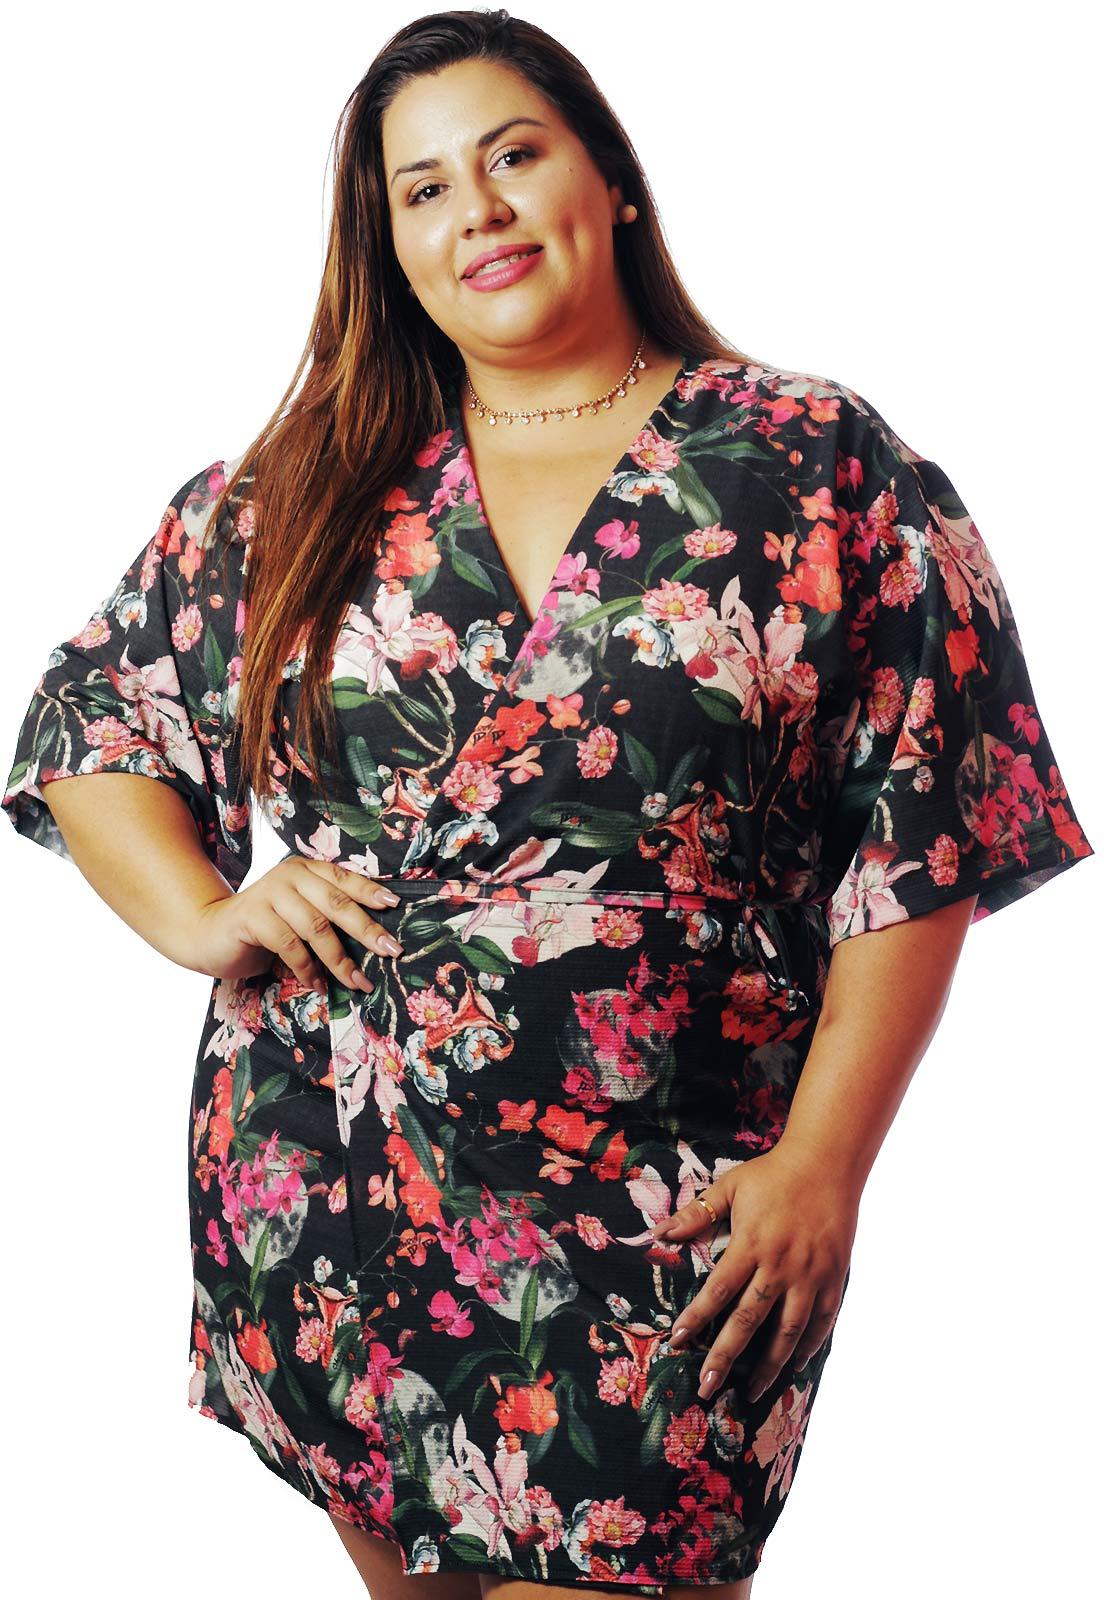 Kimono Plus Size Feminista Útero Floral de Amor Cherry Pop